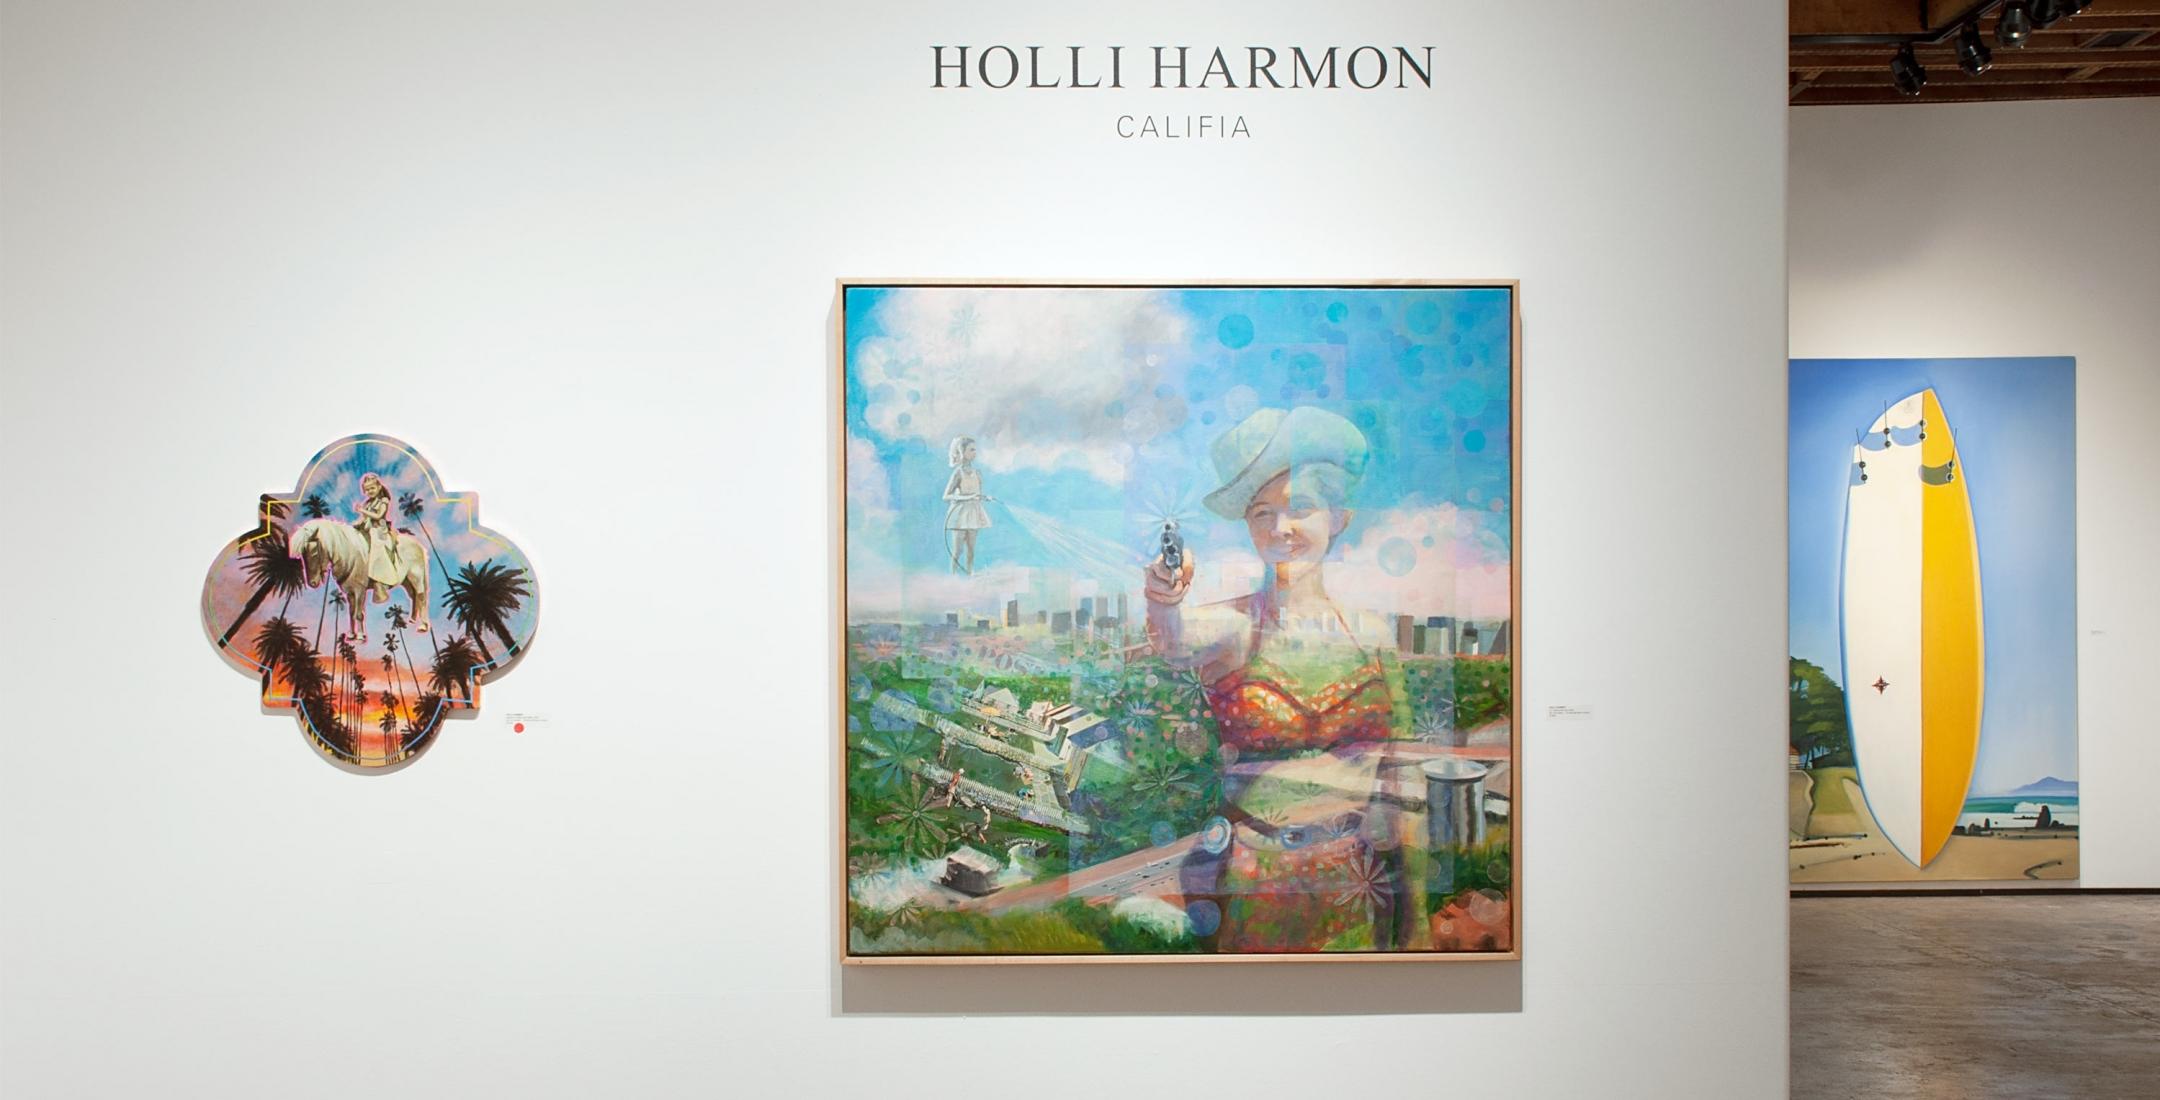 Installation photograph of HOLLI HARMON: Califia